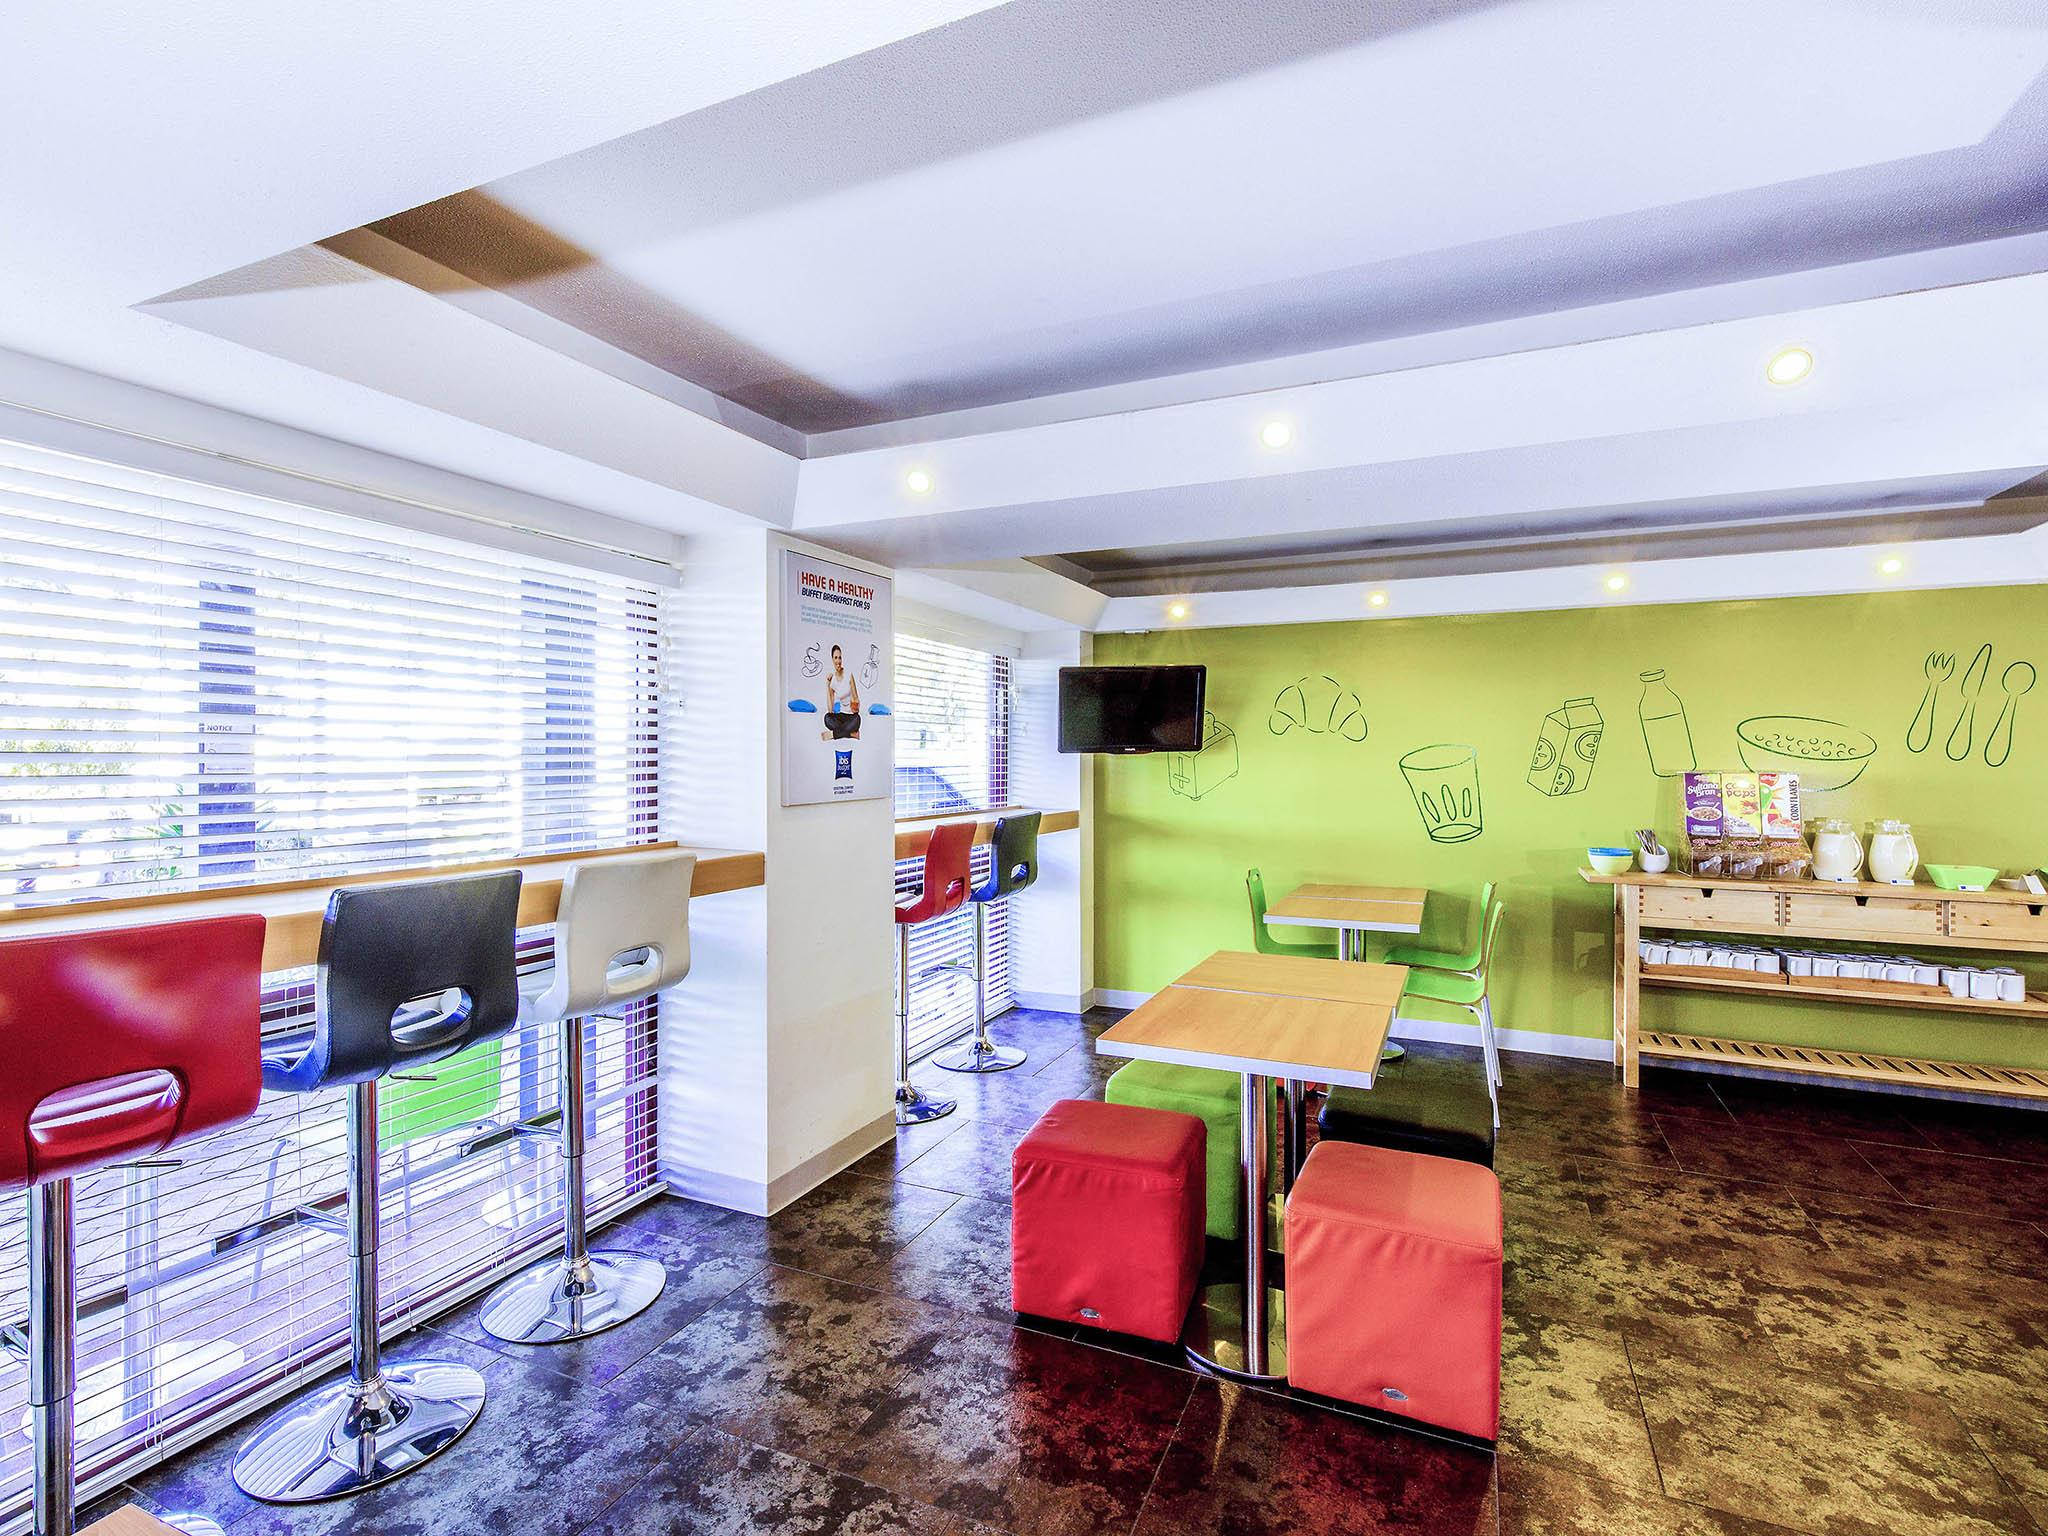 Hotel Ibis Budget Campbelltown